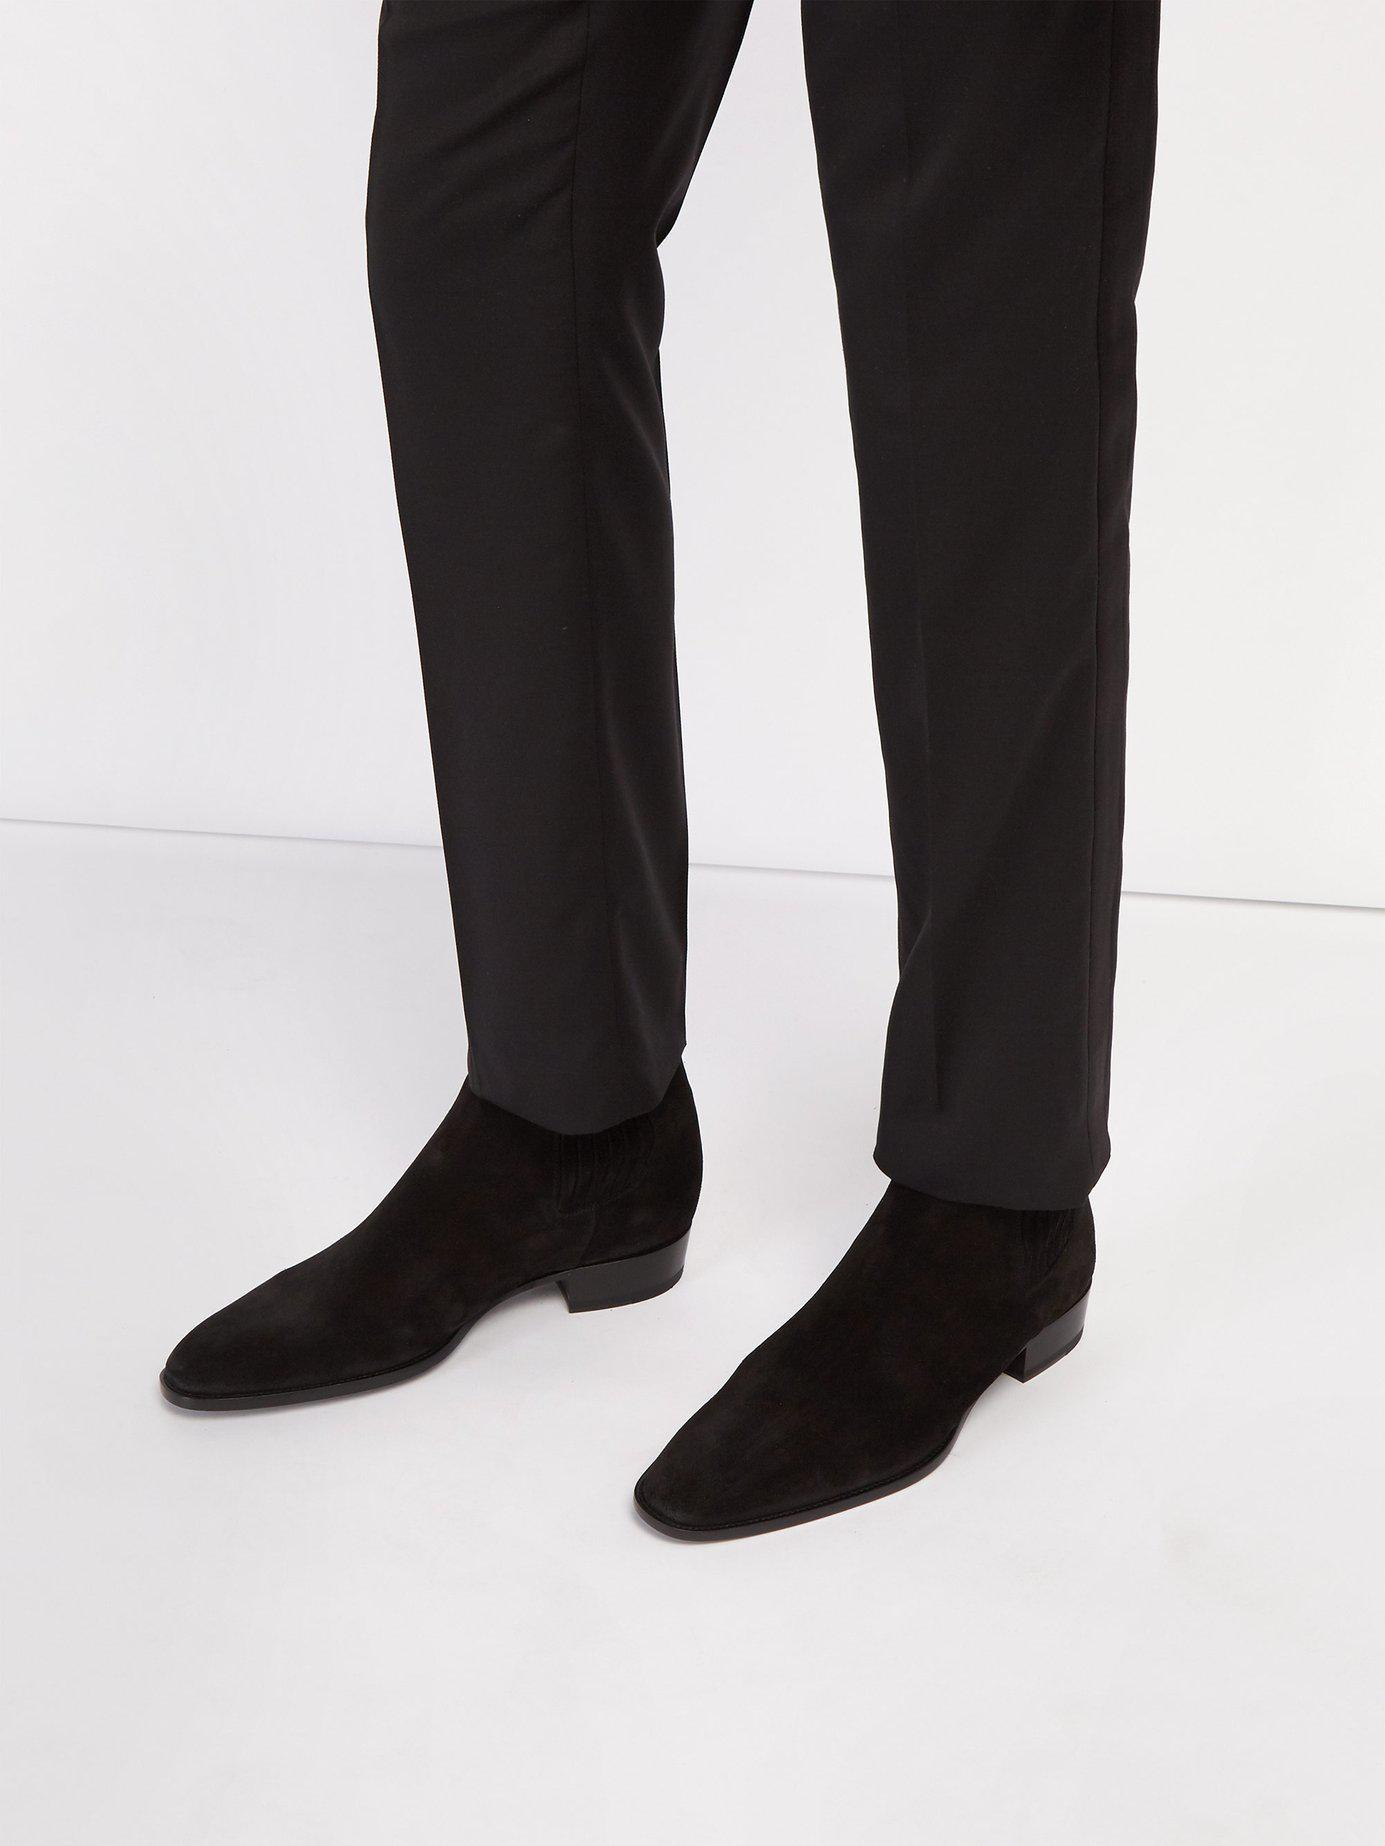 0c3911206fc6 Lyst - Saint Laurent Wyatt Suede Chelsea Boots in Black for Men